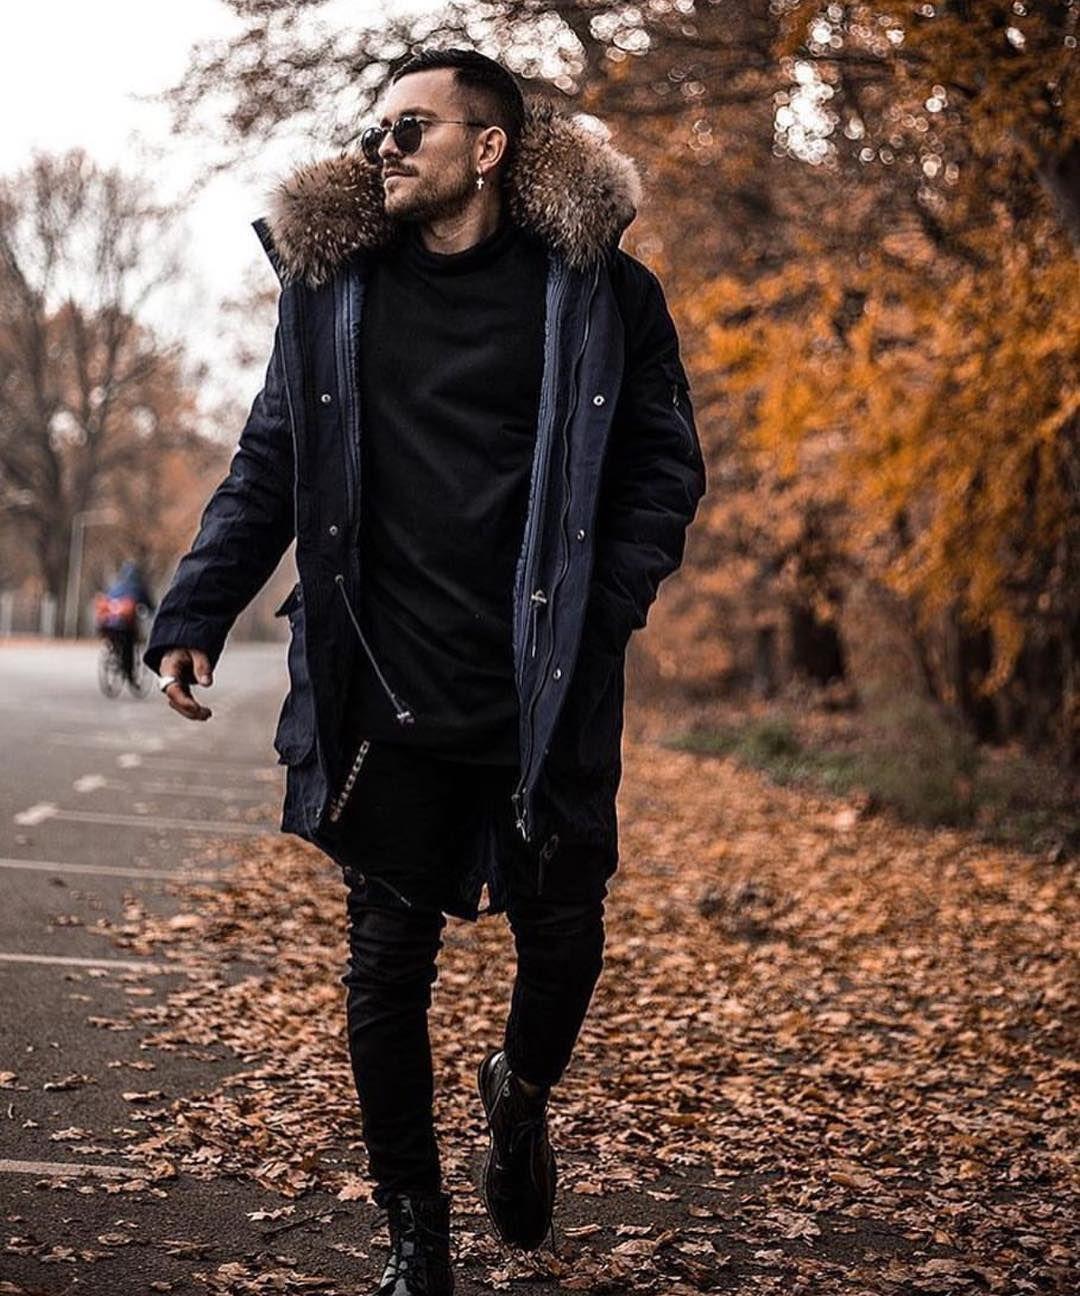 BLACK FRIDAY DEALS Save  in Fur Parkas u Jackets Shop now at